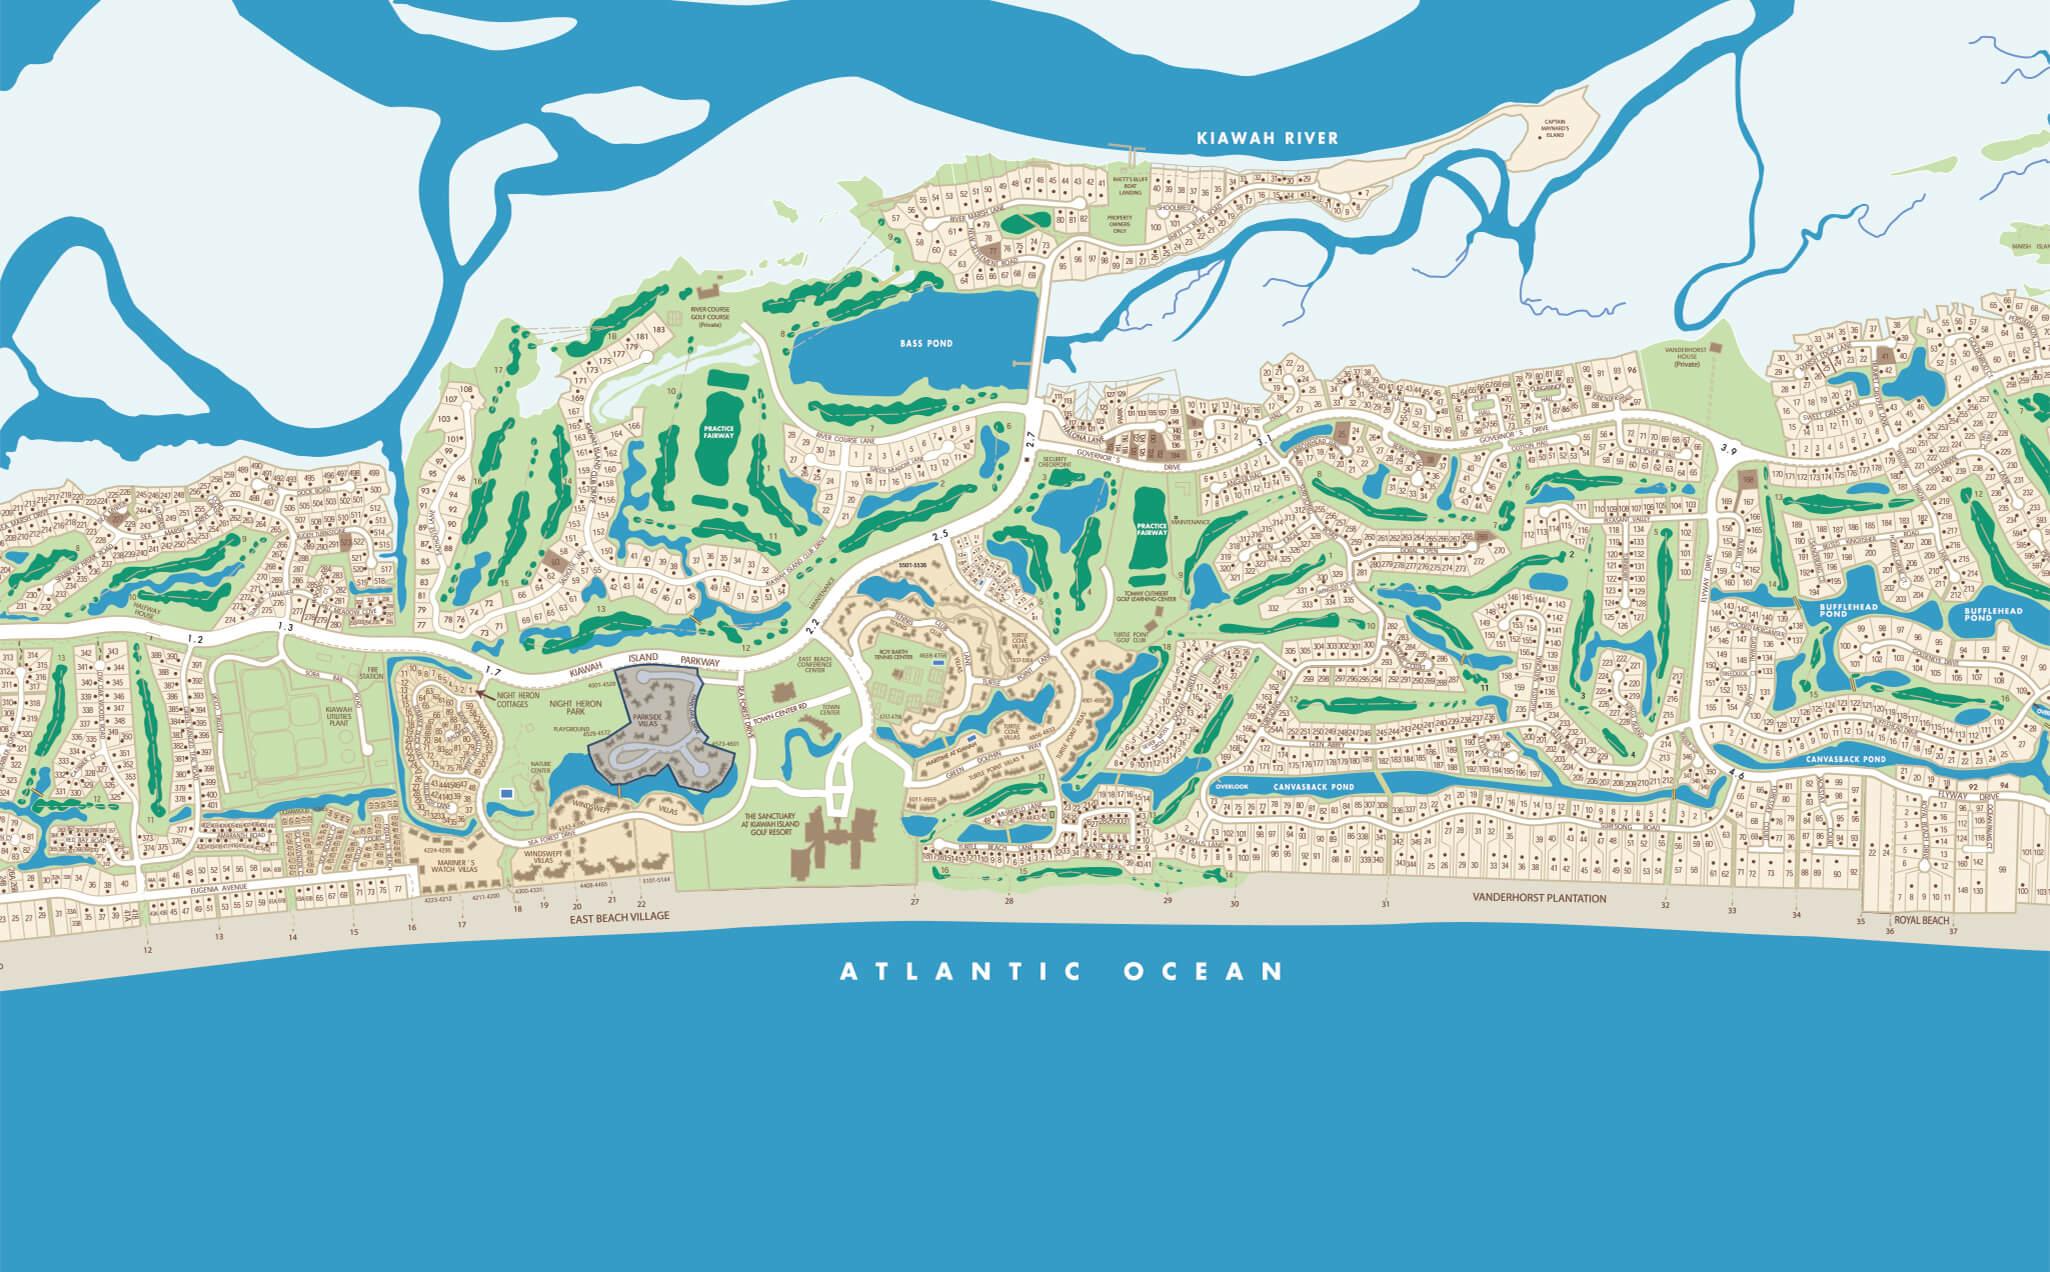 Kiawah Island Map Parkside Villas | Kiawah Island Real Estate